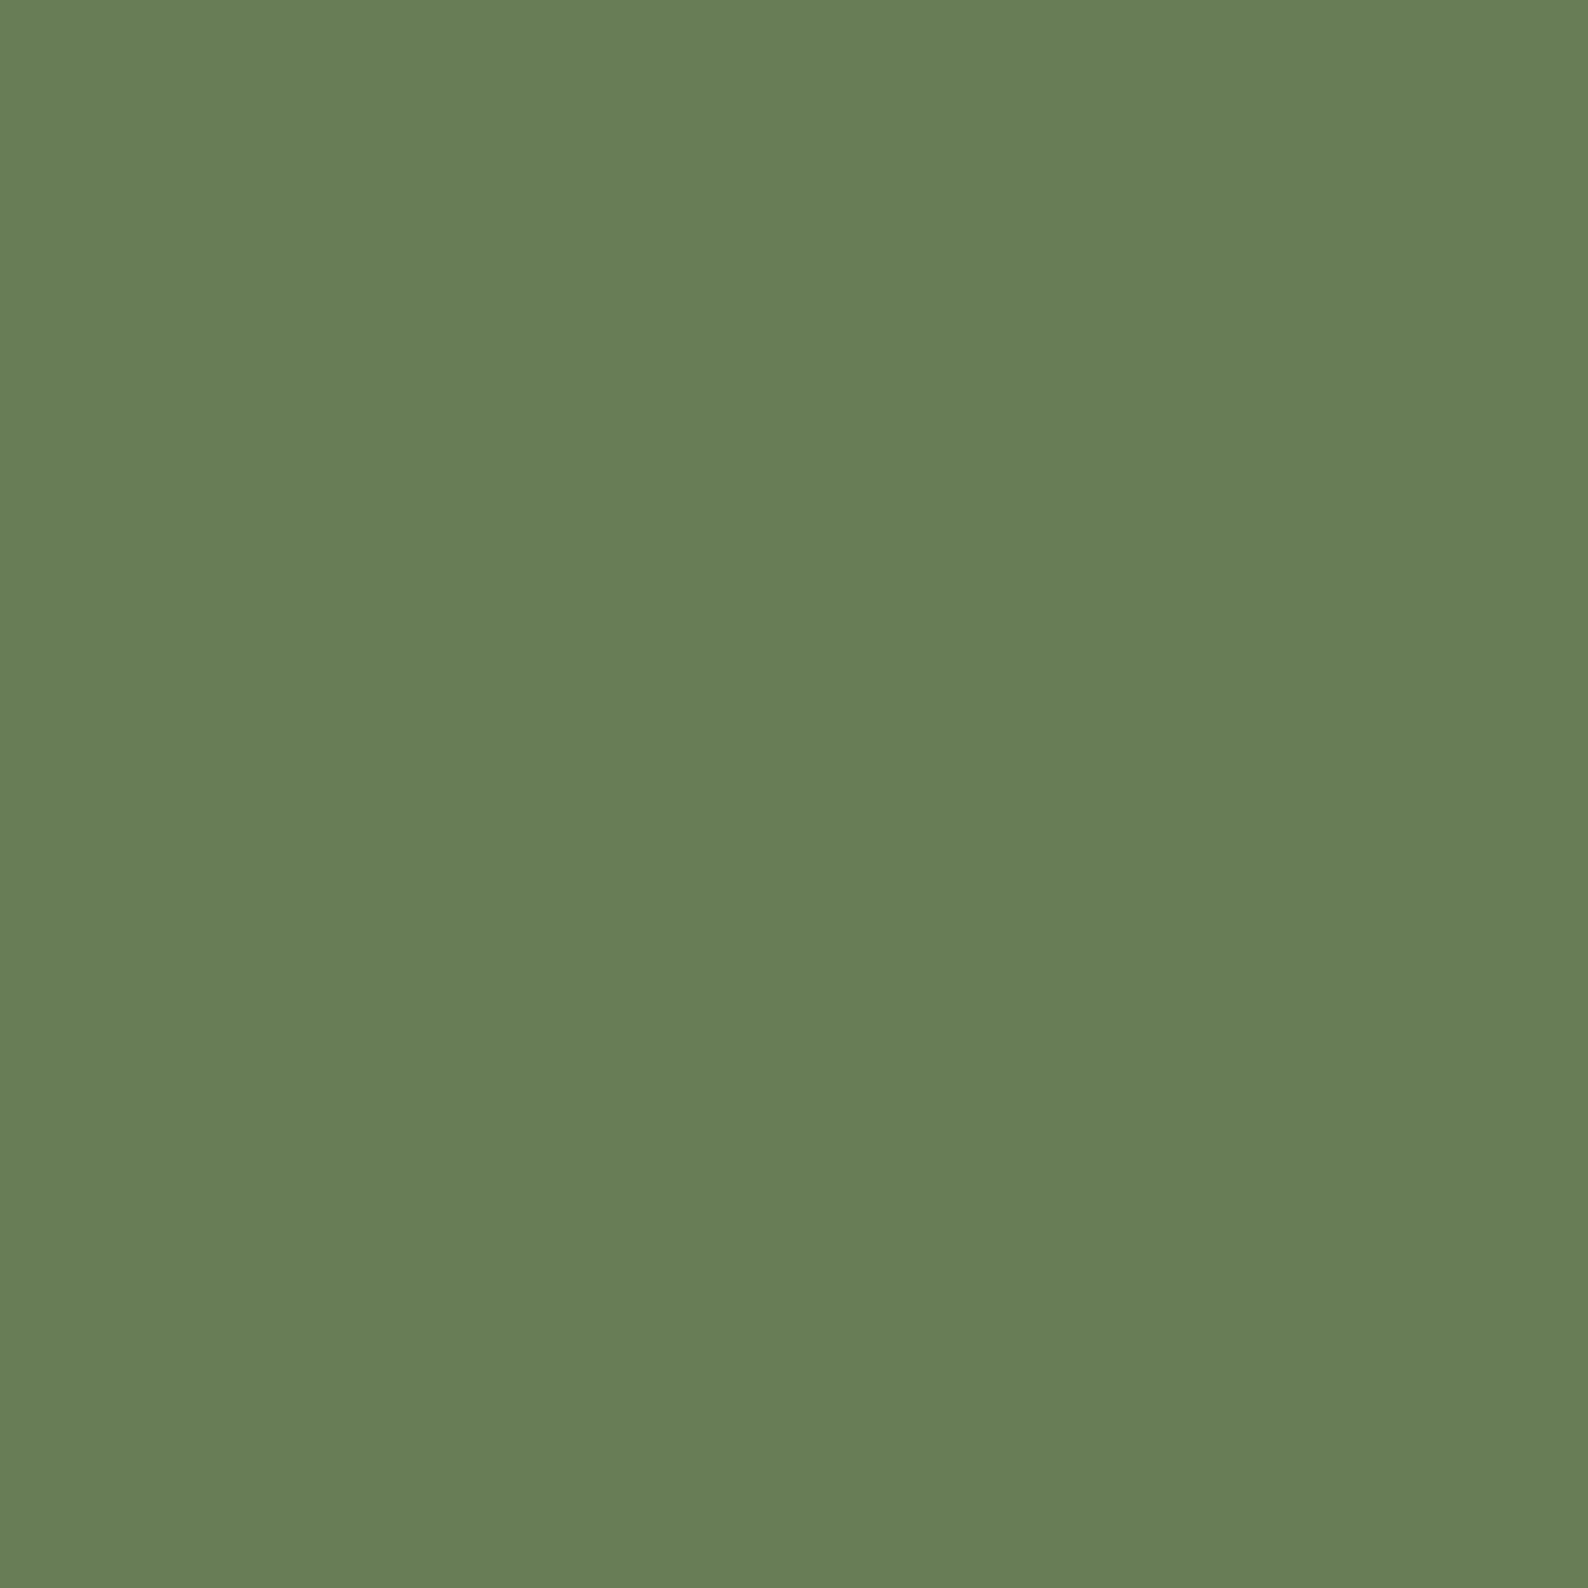 Patina Green crib sheet - Dusty green baby bedding - Solid crib bedding - Nursing pillow cover Loung